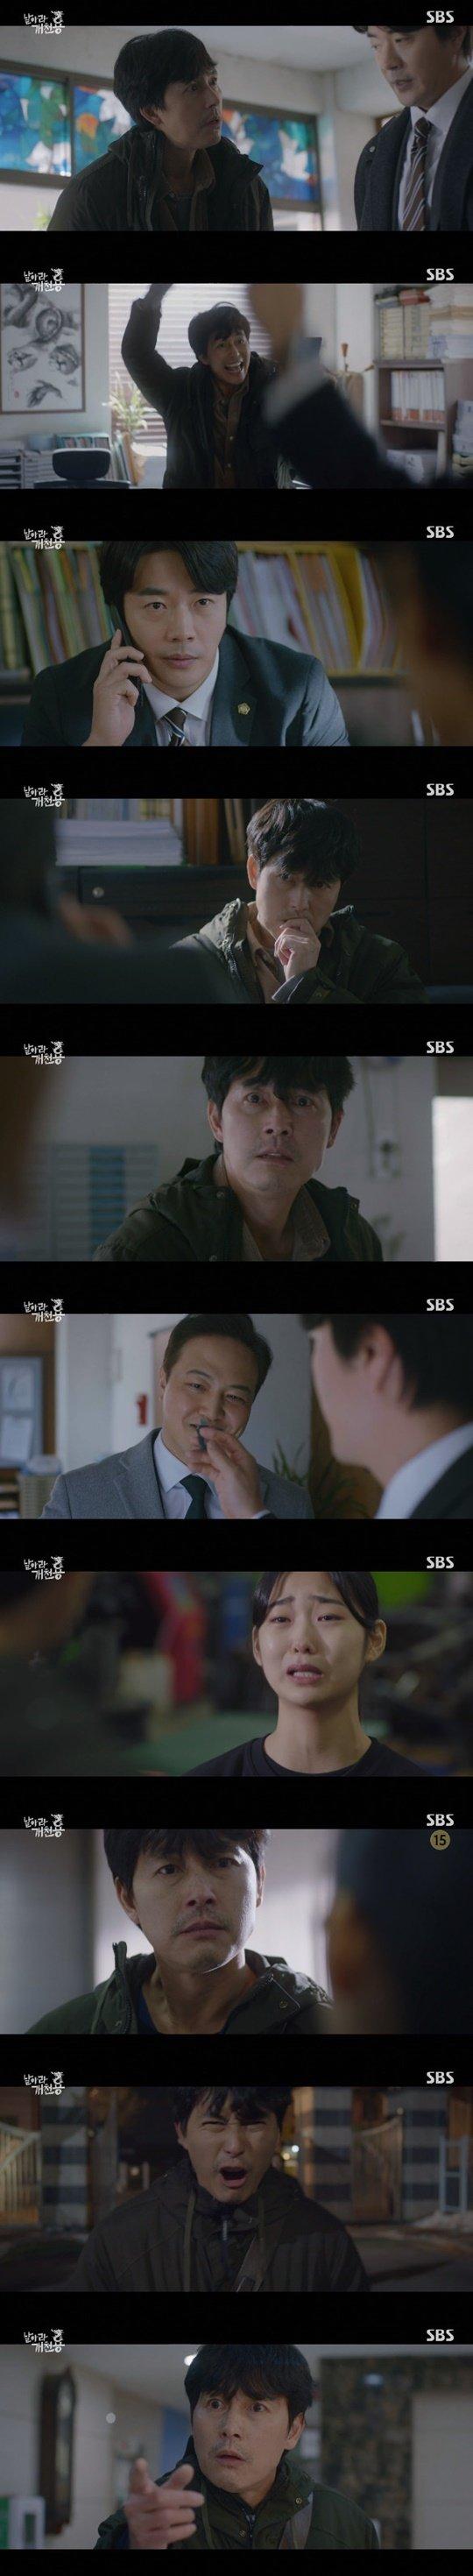 SBS '날아라 개천용' © 뉴스1